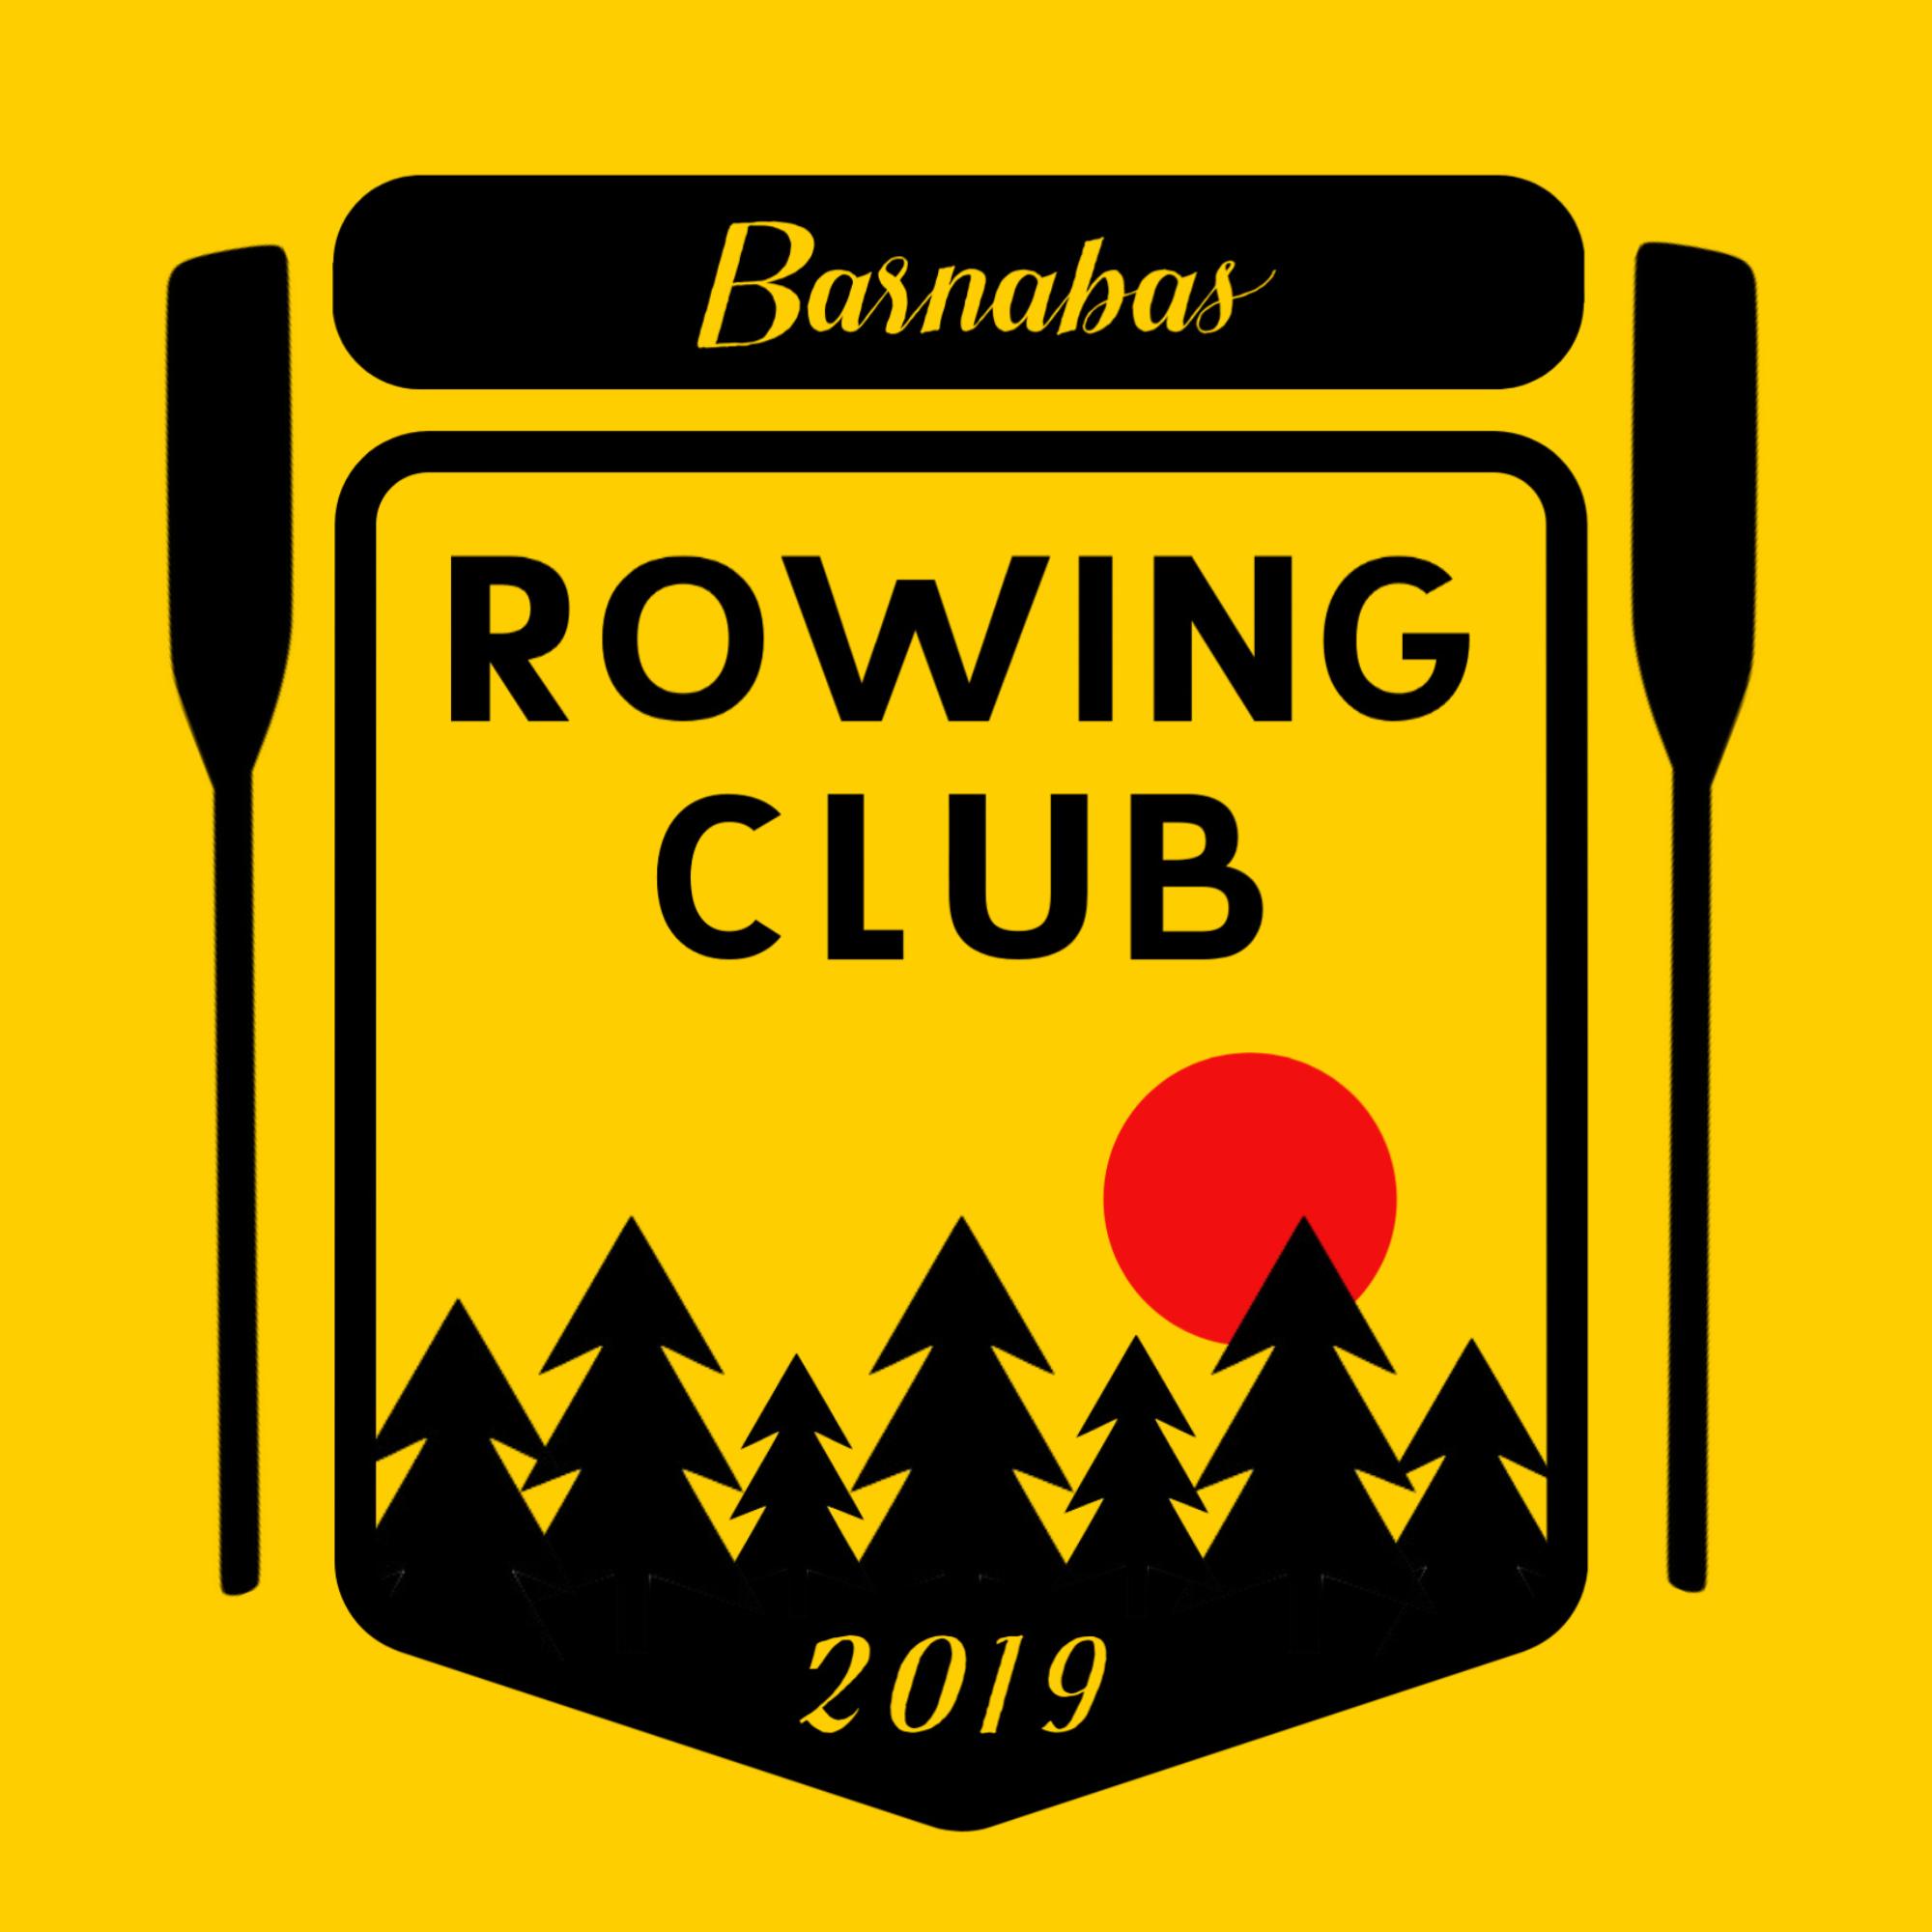 Row Club